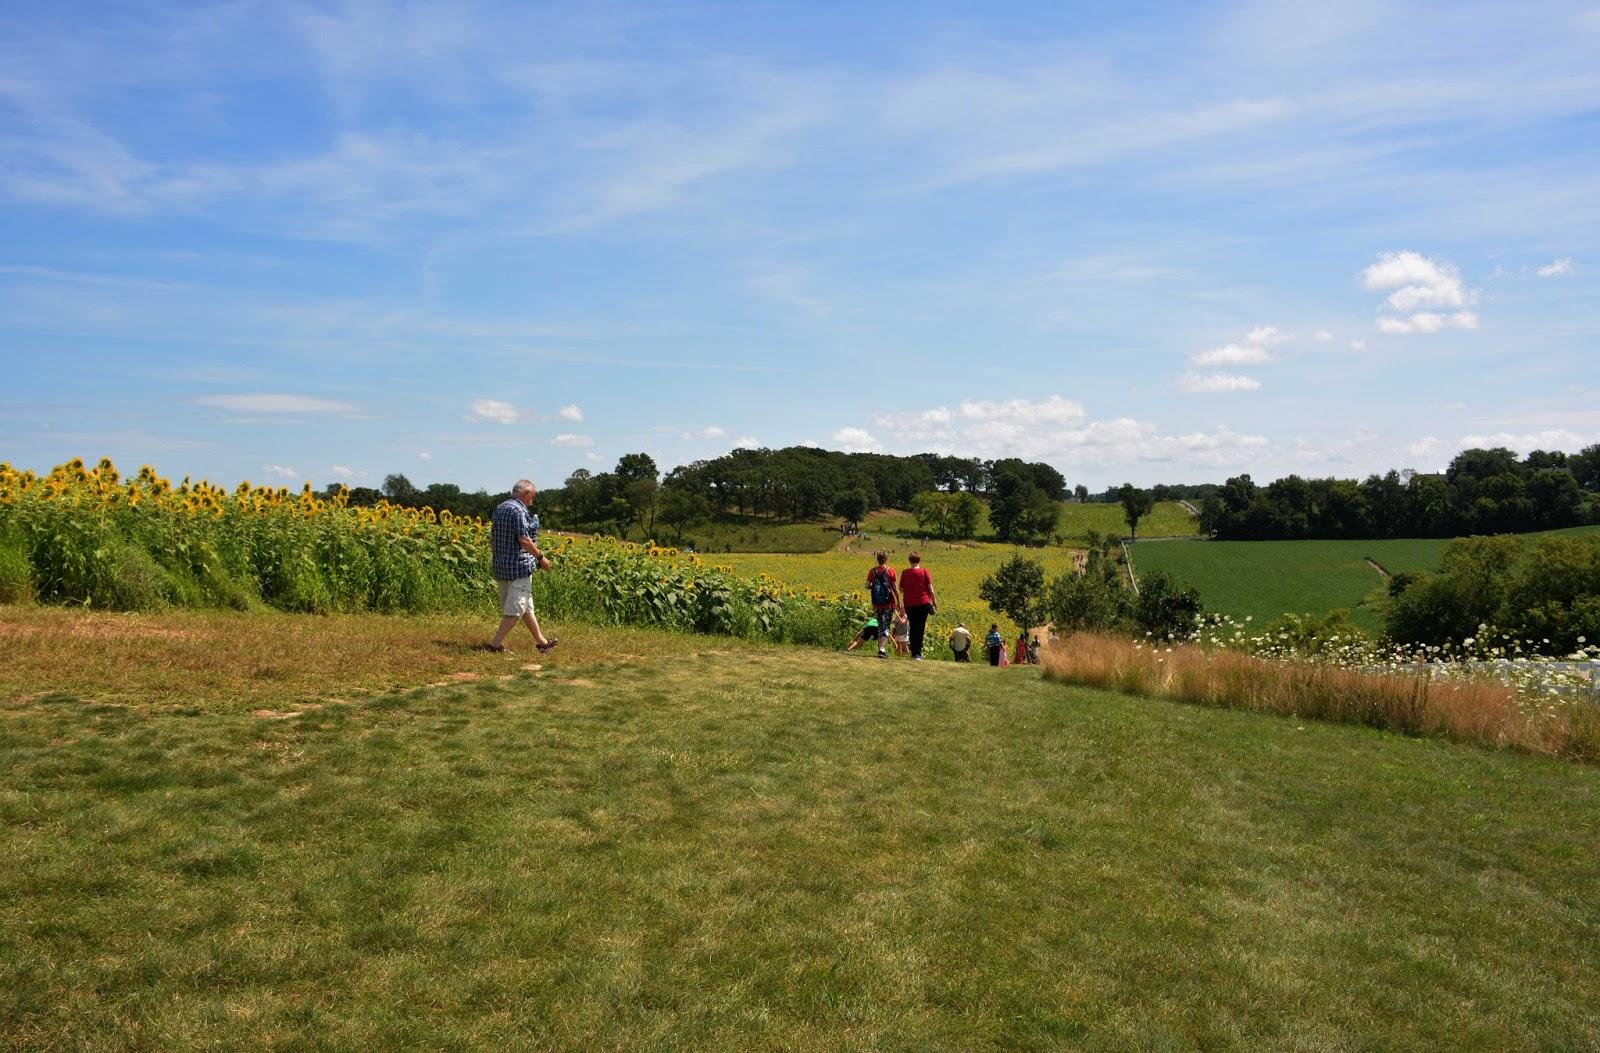 sunflower fields 2 by - photo #49